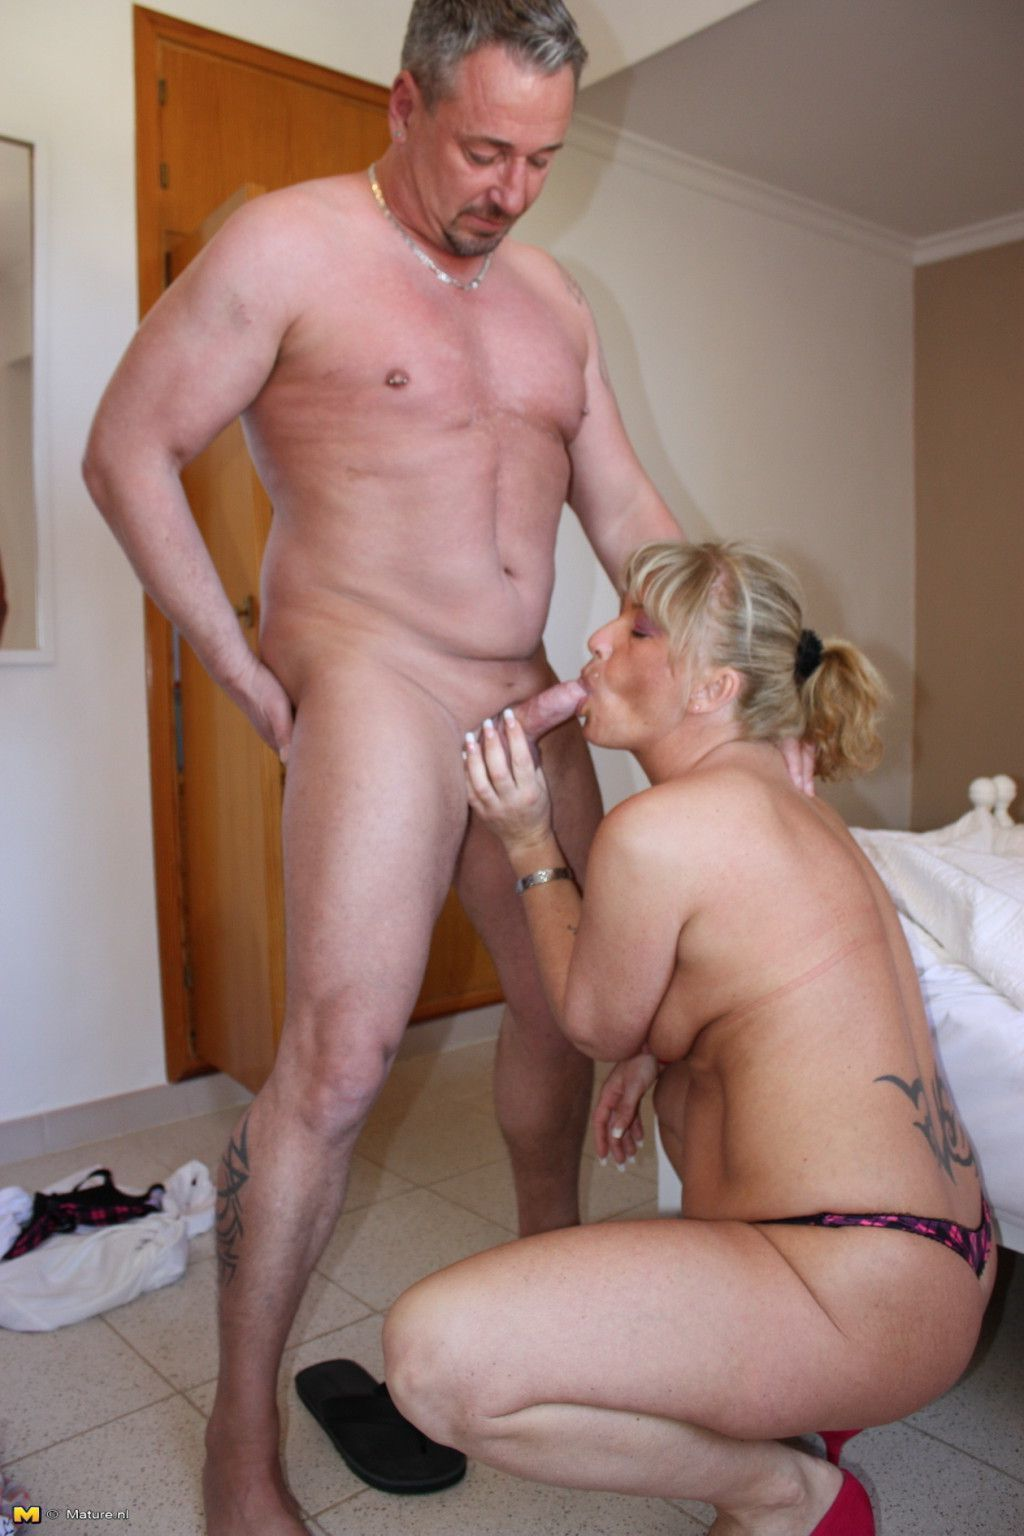 Bisexual German - Two bisexual german housewives share one guy